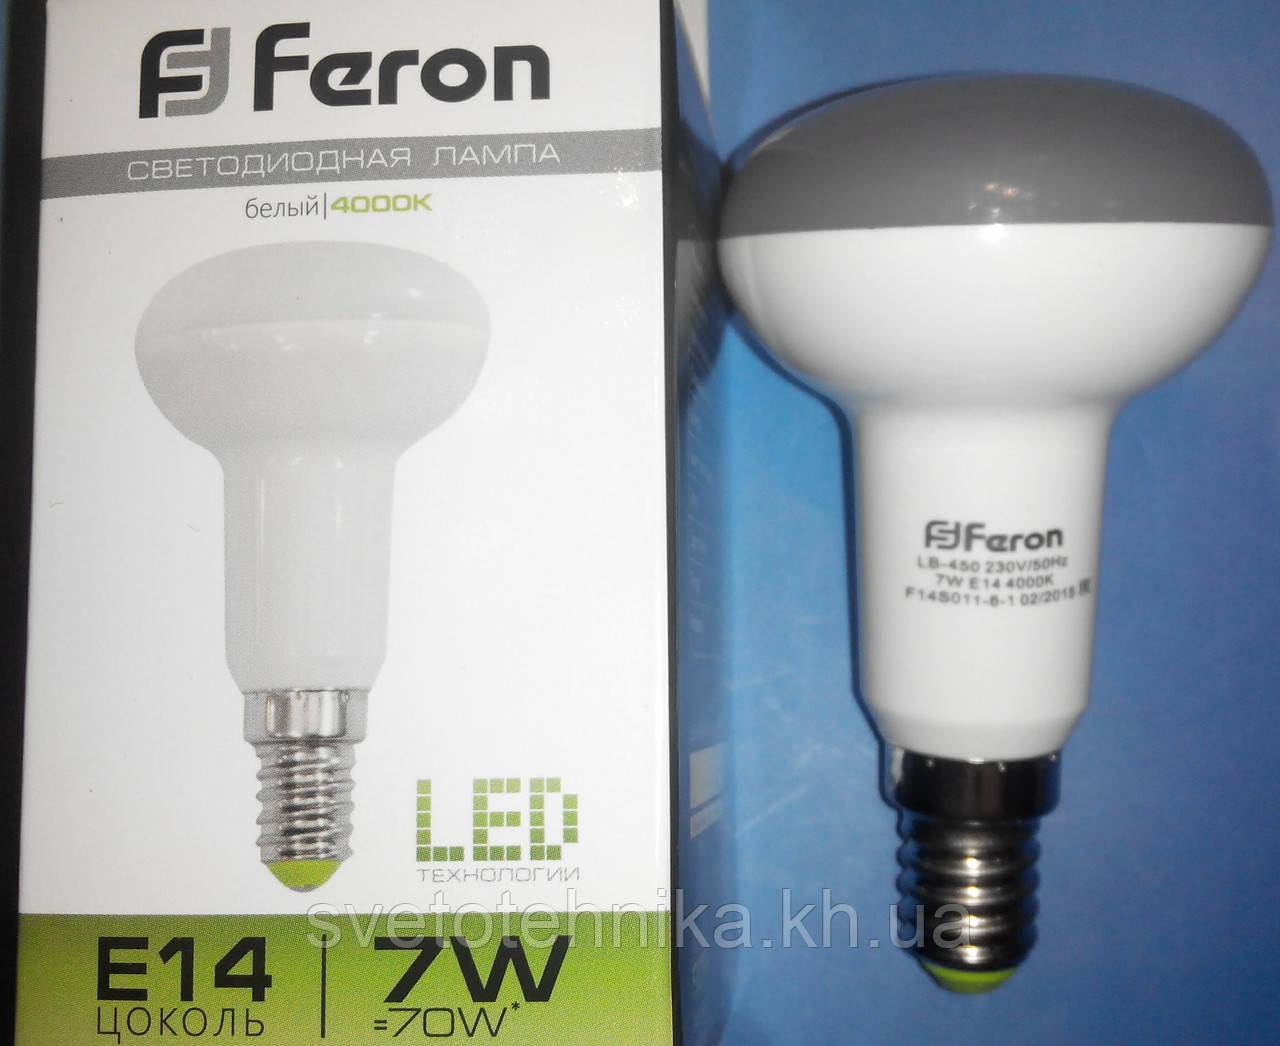 Светодиодная лампа Feron LB450 7W 4000K